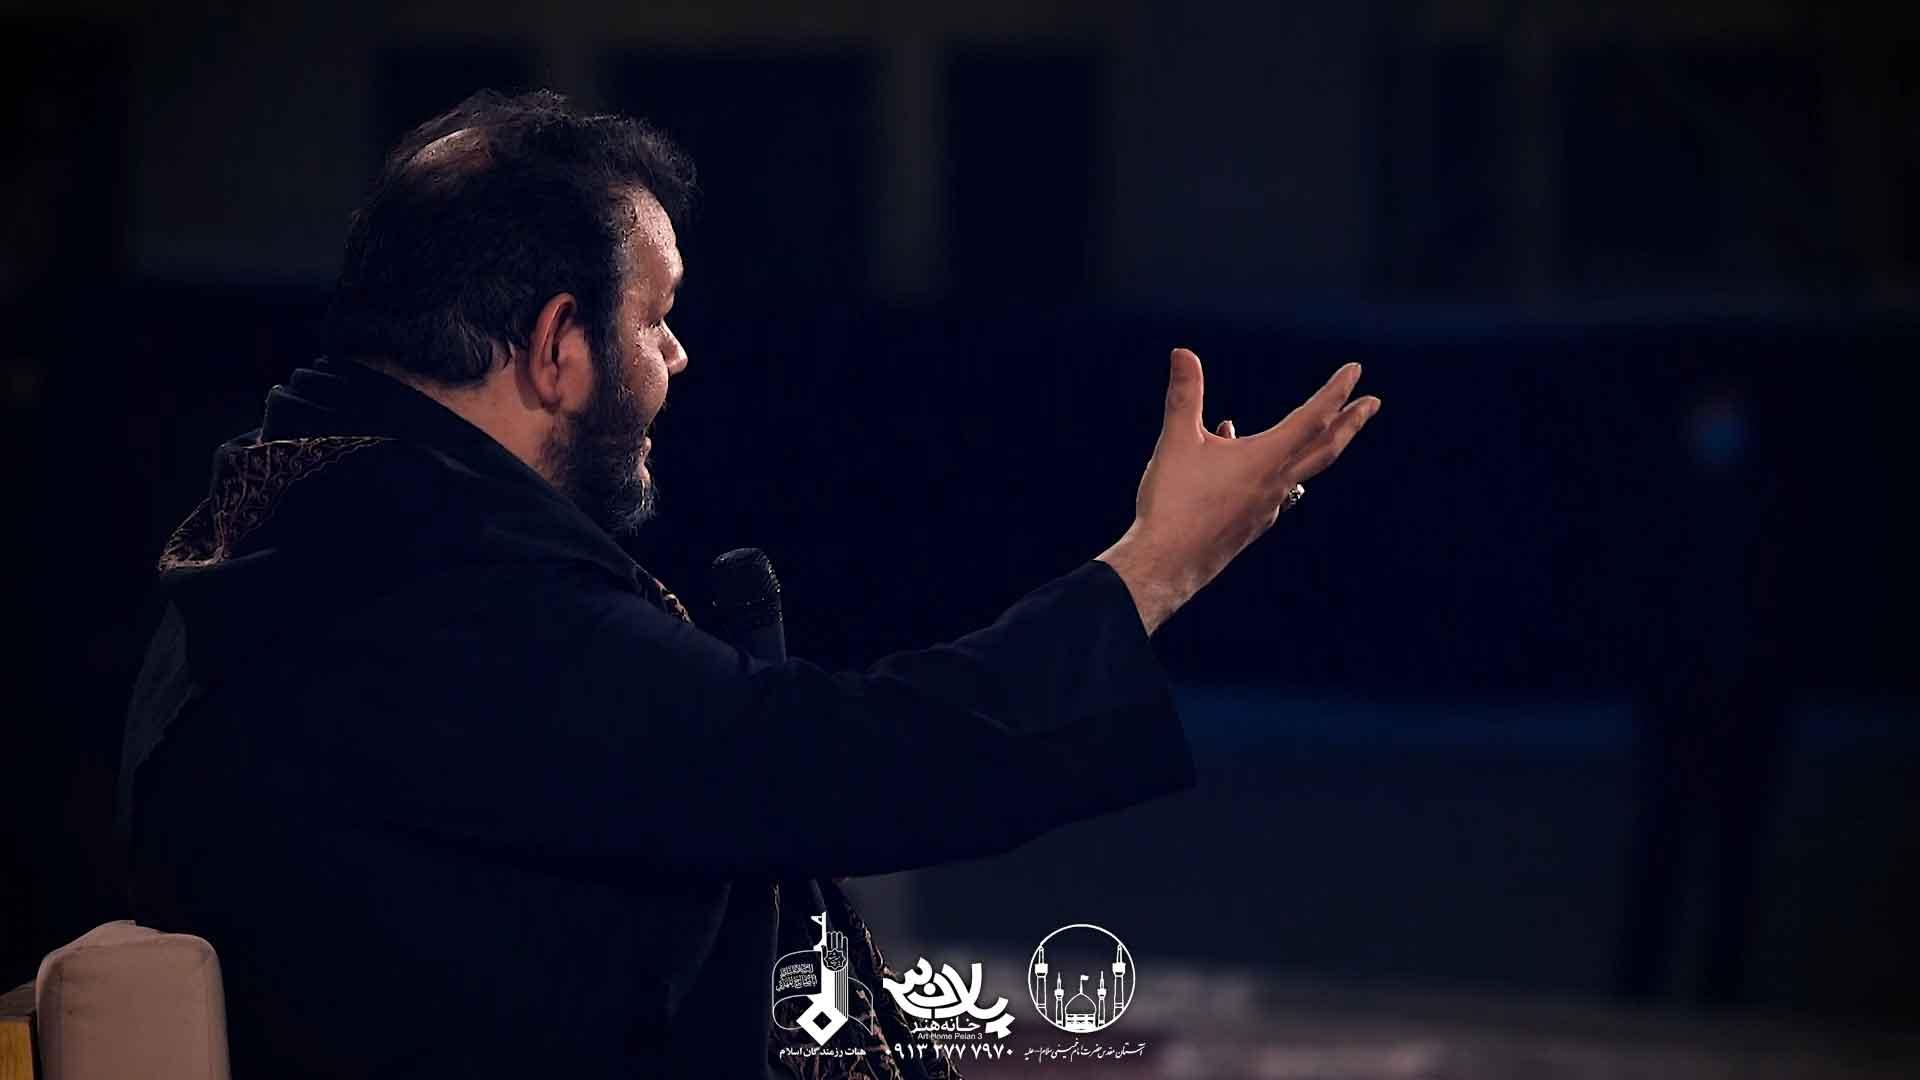 سفر حج حیدر خمسه